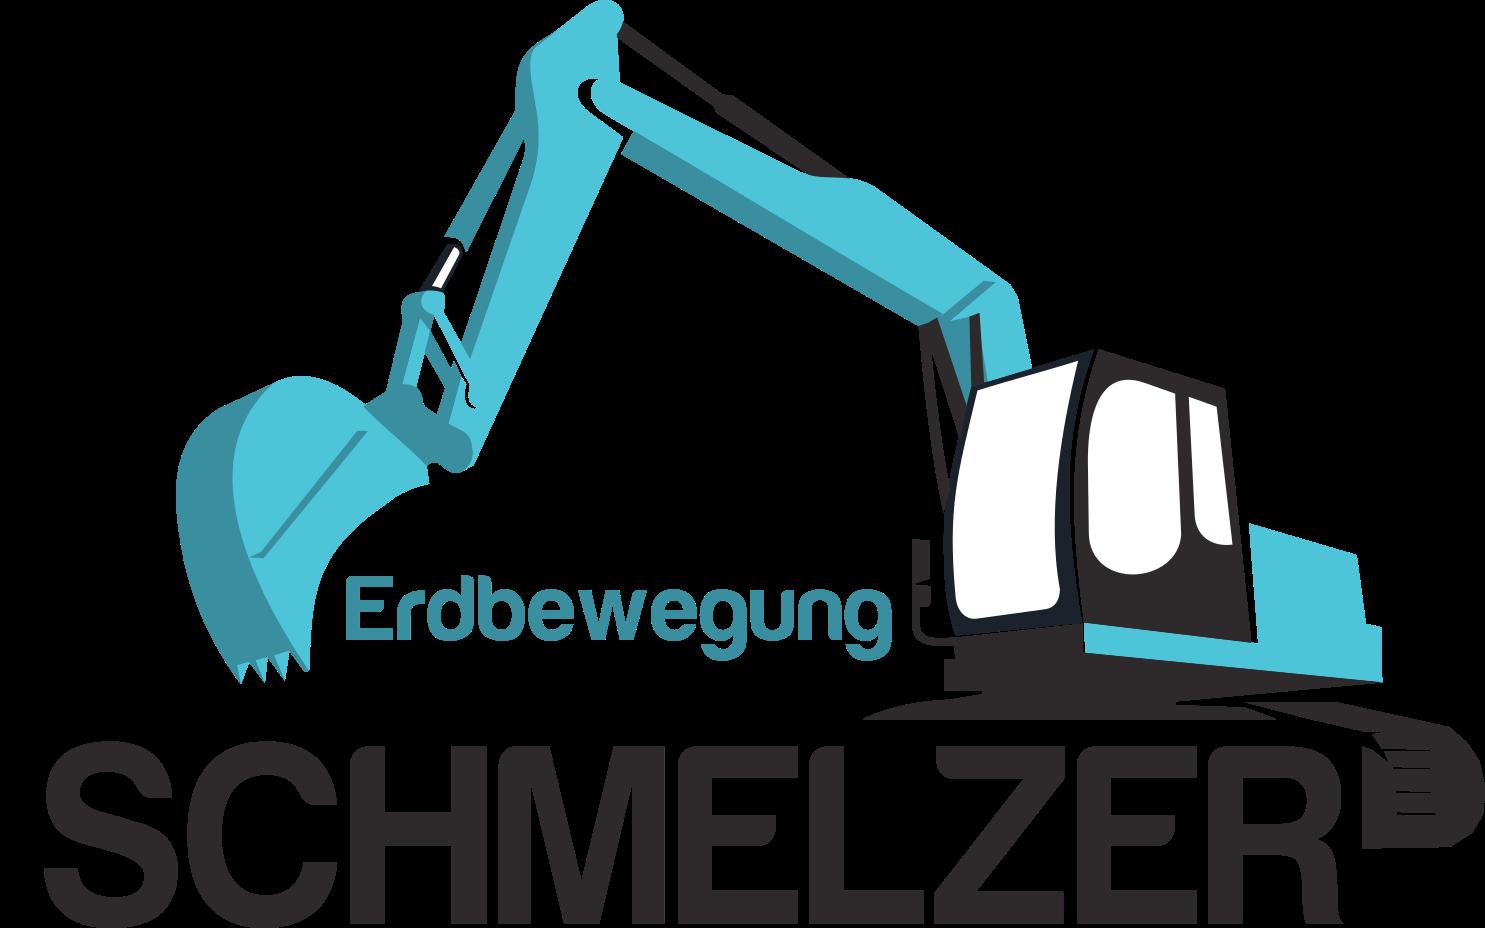 Bagger Graz - Erdbewegung Schmelzer